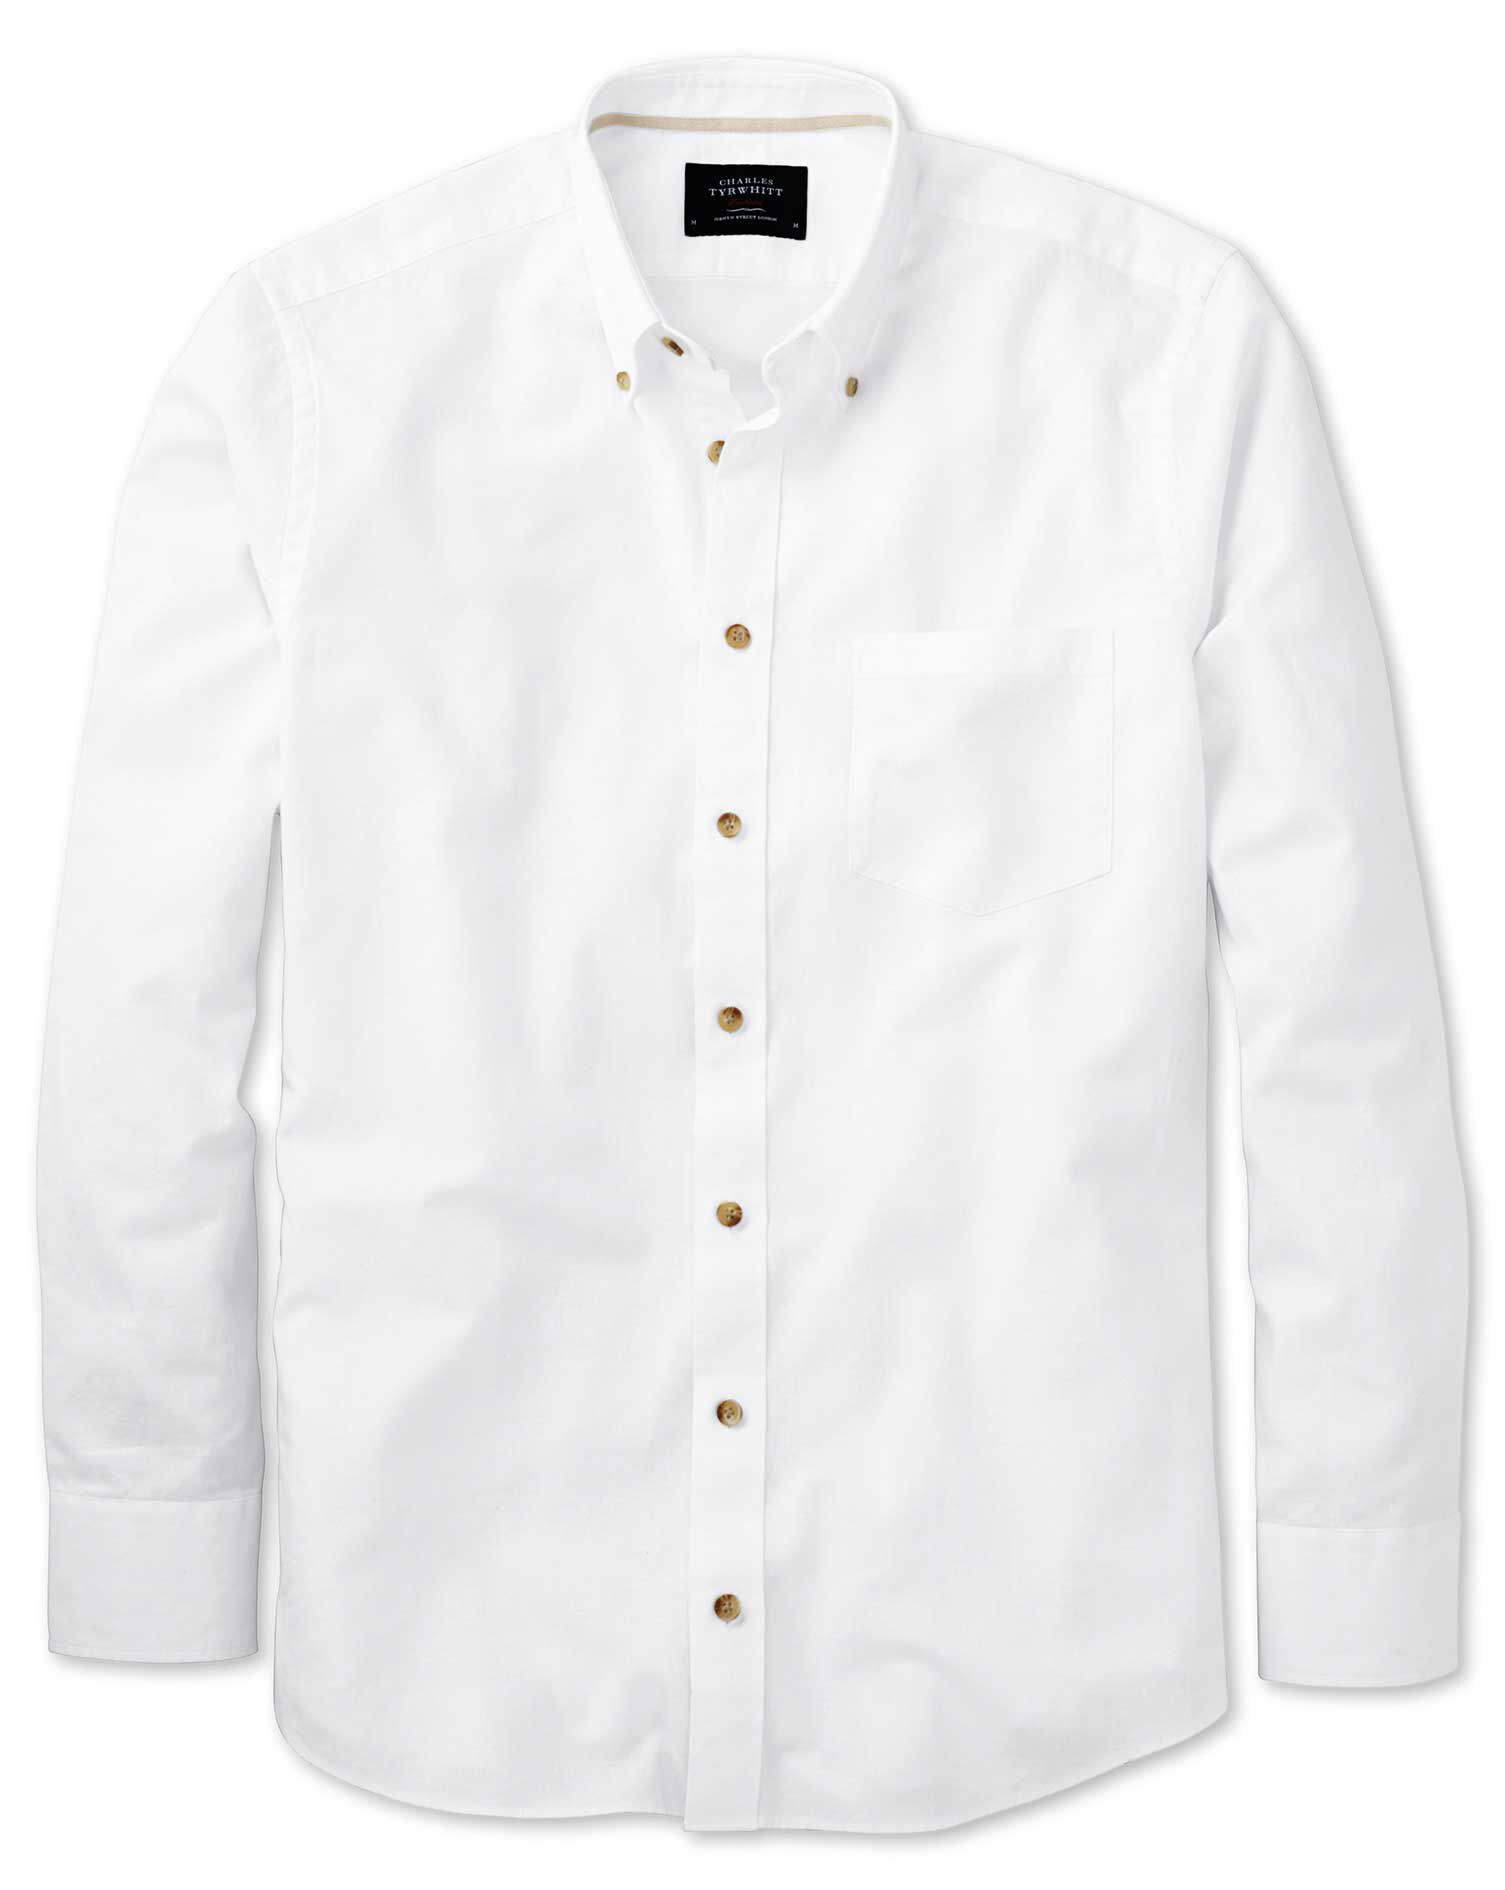 Classic Fit White Cotton Shirt Single Cuff Size XXL by Charles Tyrwhitt